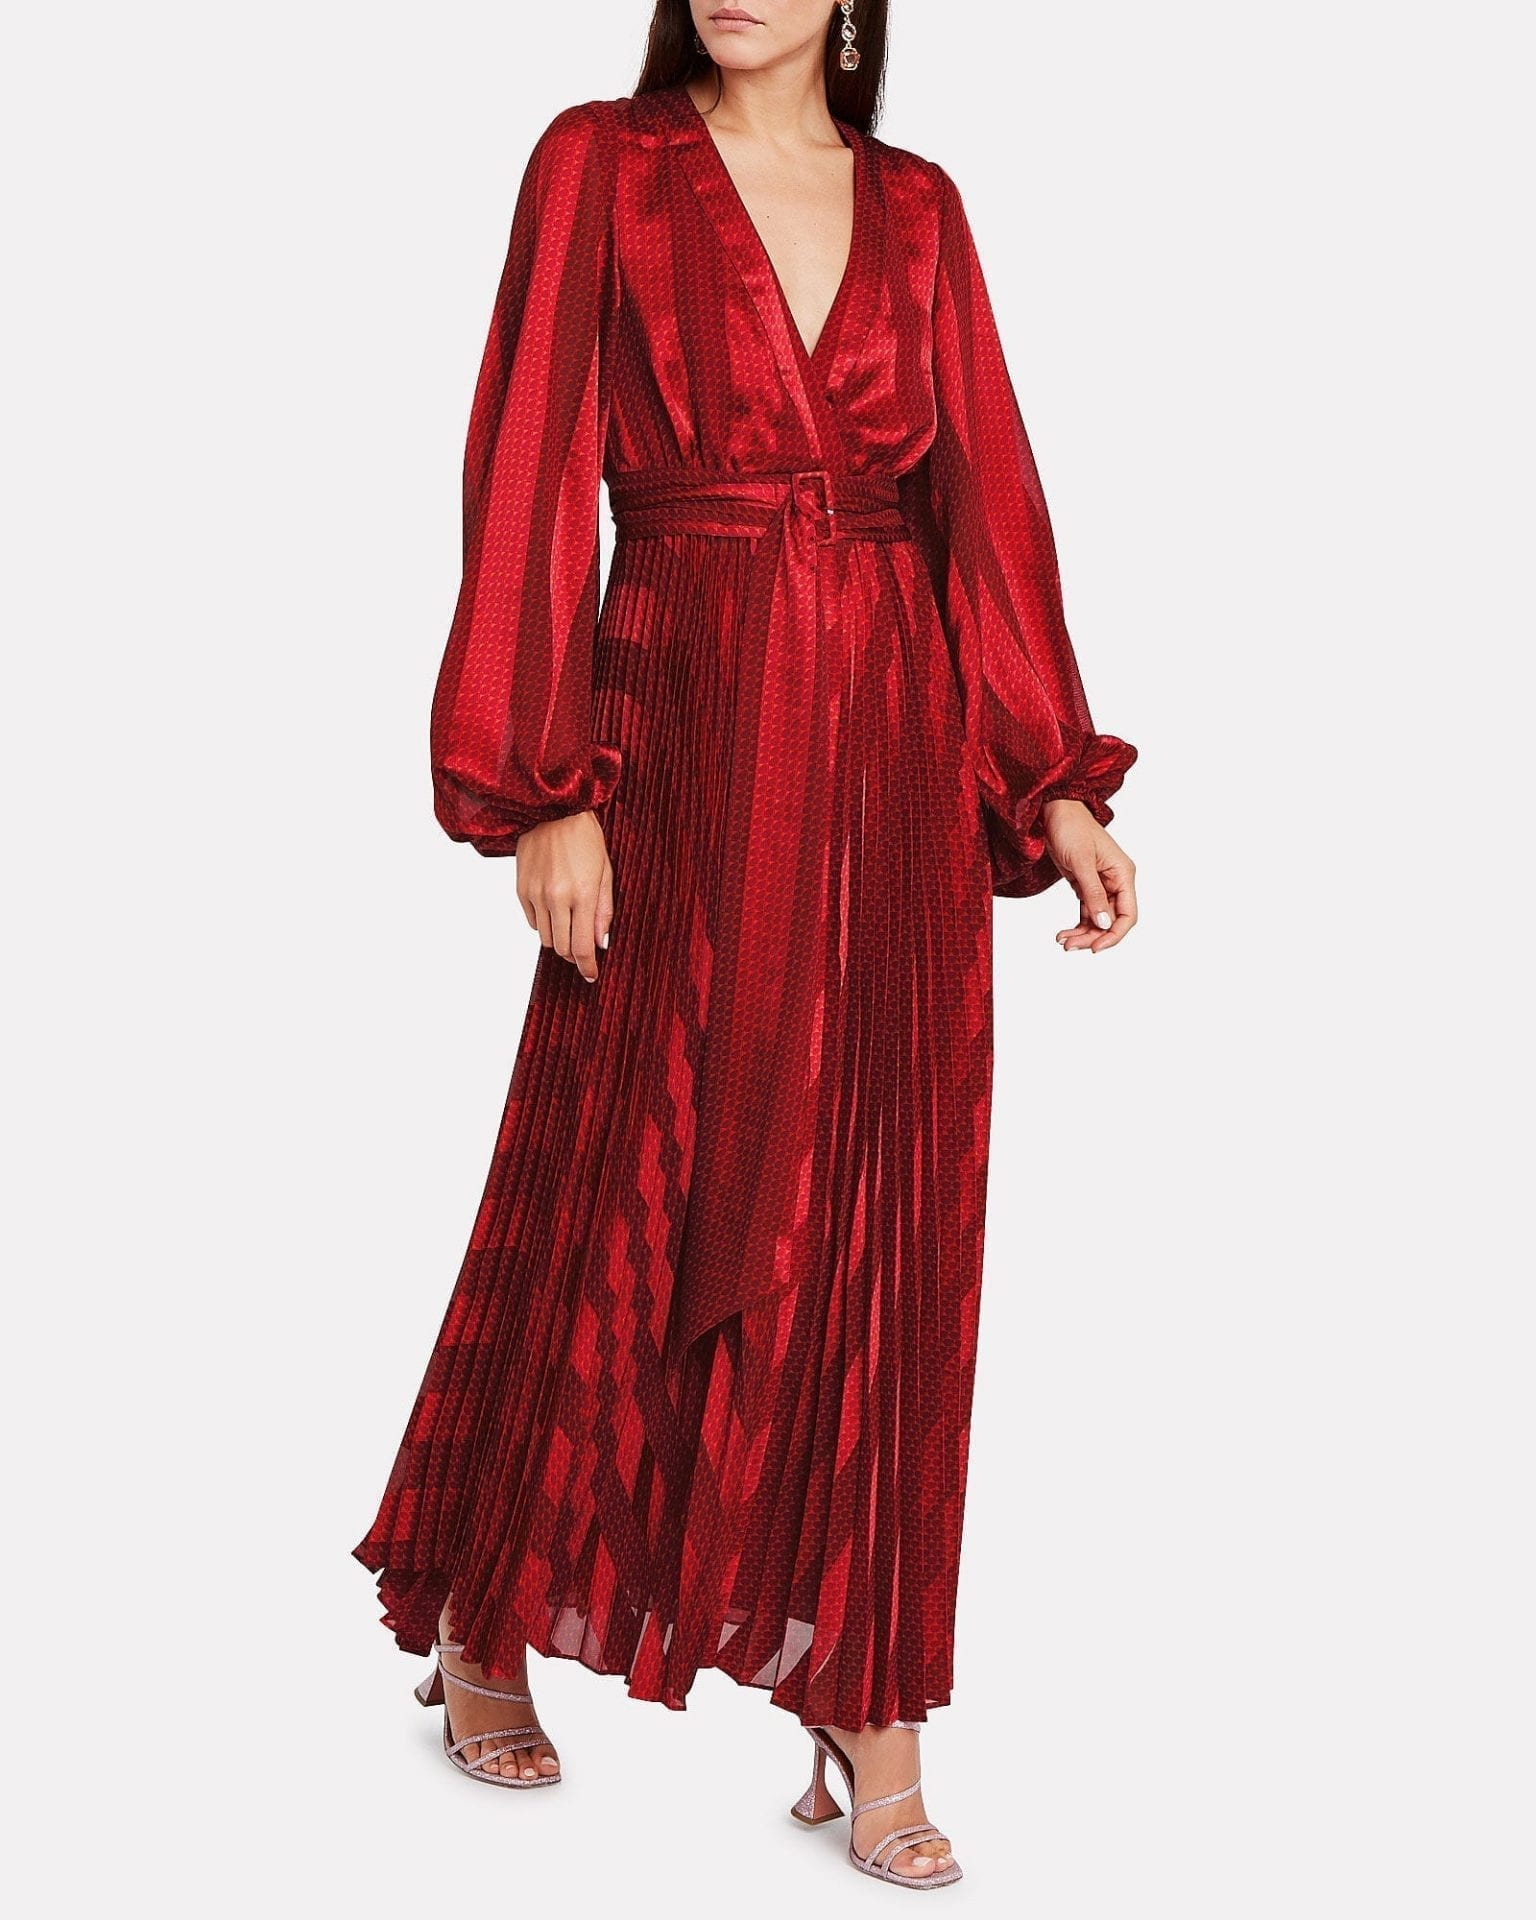 ALEXIS Salomo Pleated Geo Print Dress